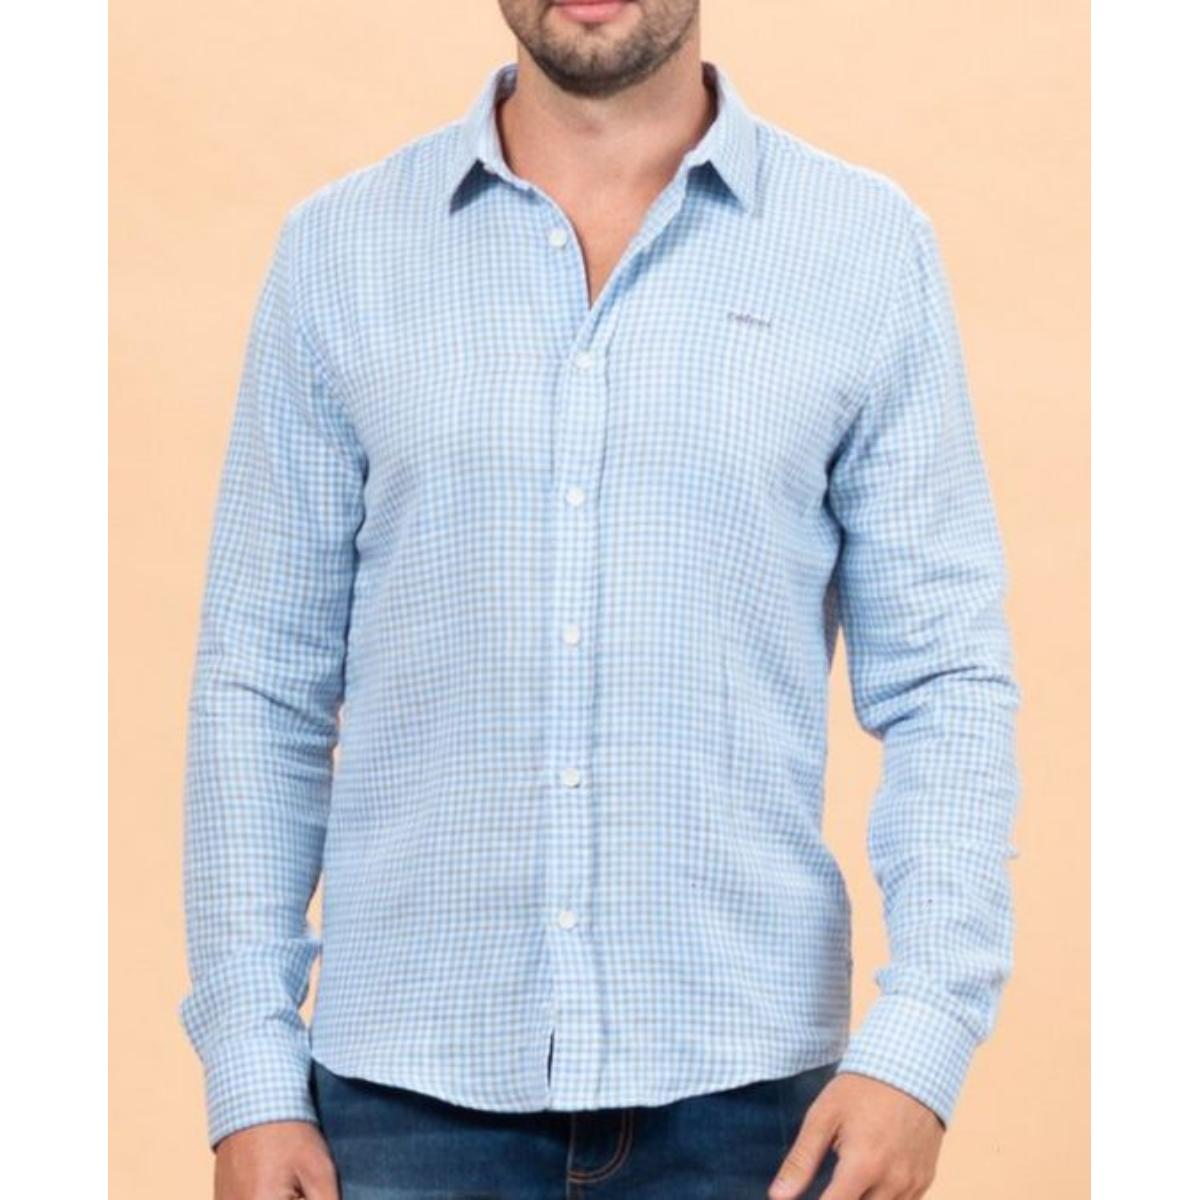 Camisa Masculina Colcci 310103640 Vc118 Branco Xadrez